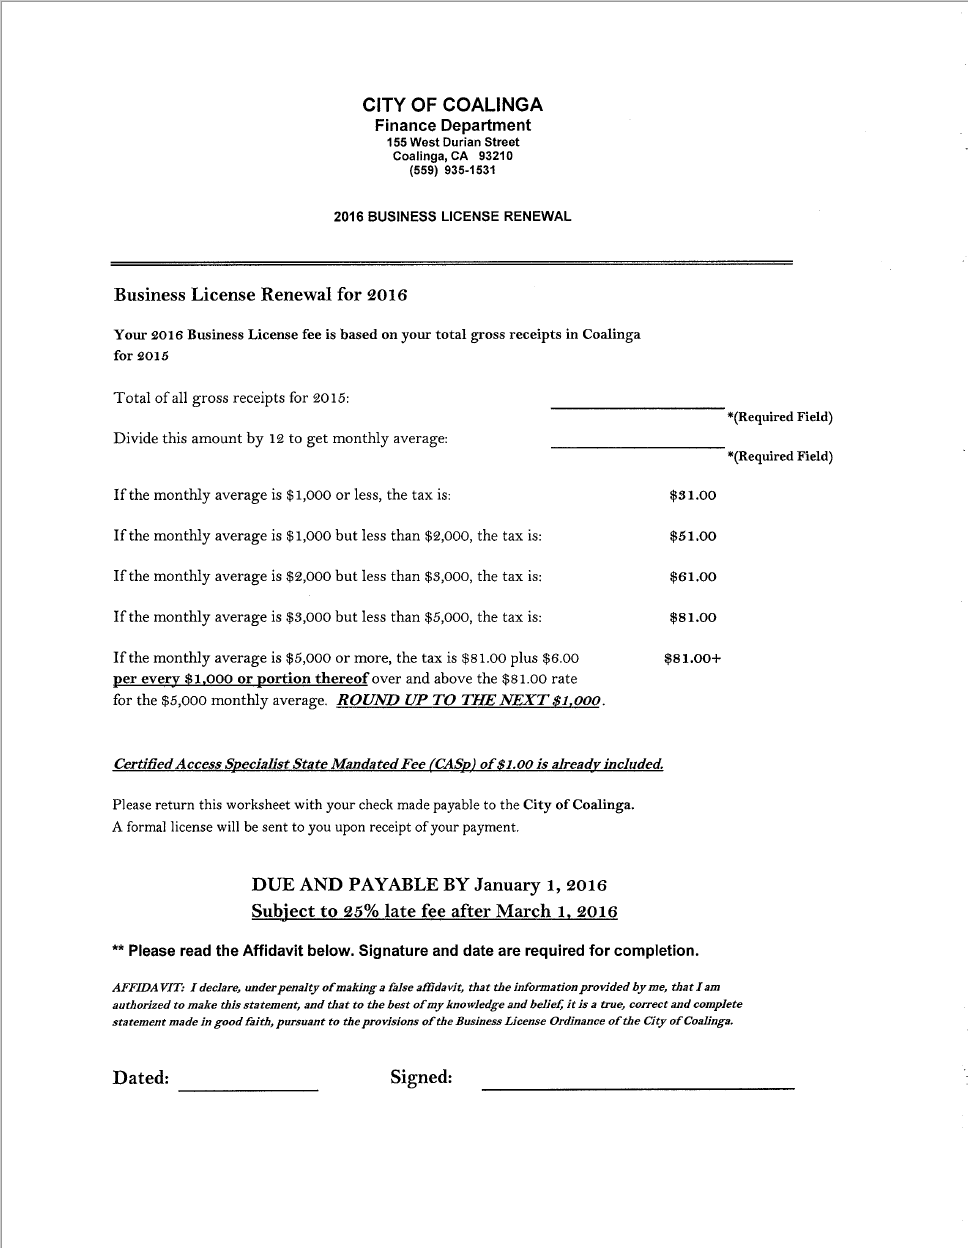 Business License Renewal.png